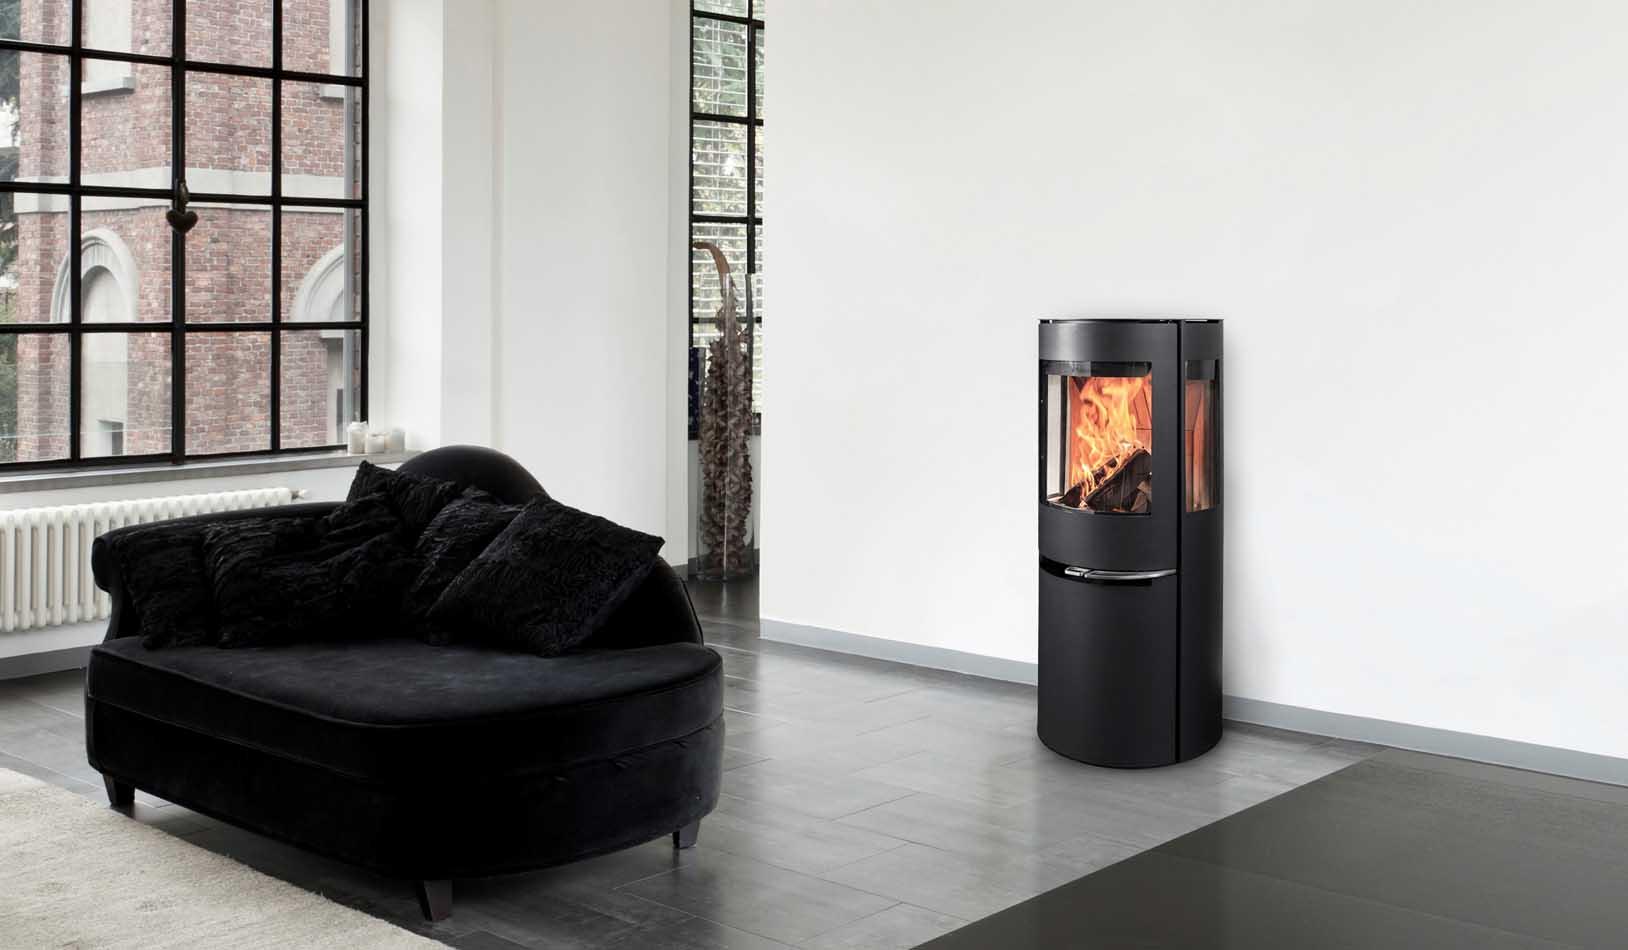 po le granul s bois mixte aduro h1. Black Bedroom Furniture Sets. Home Design Ideas